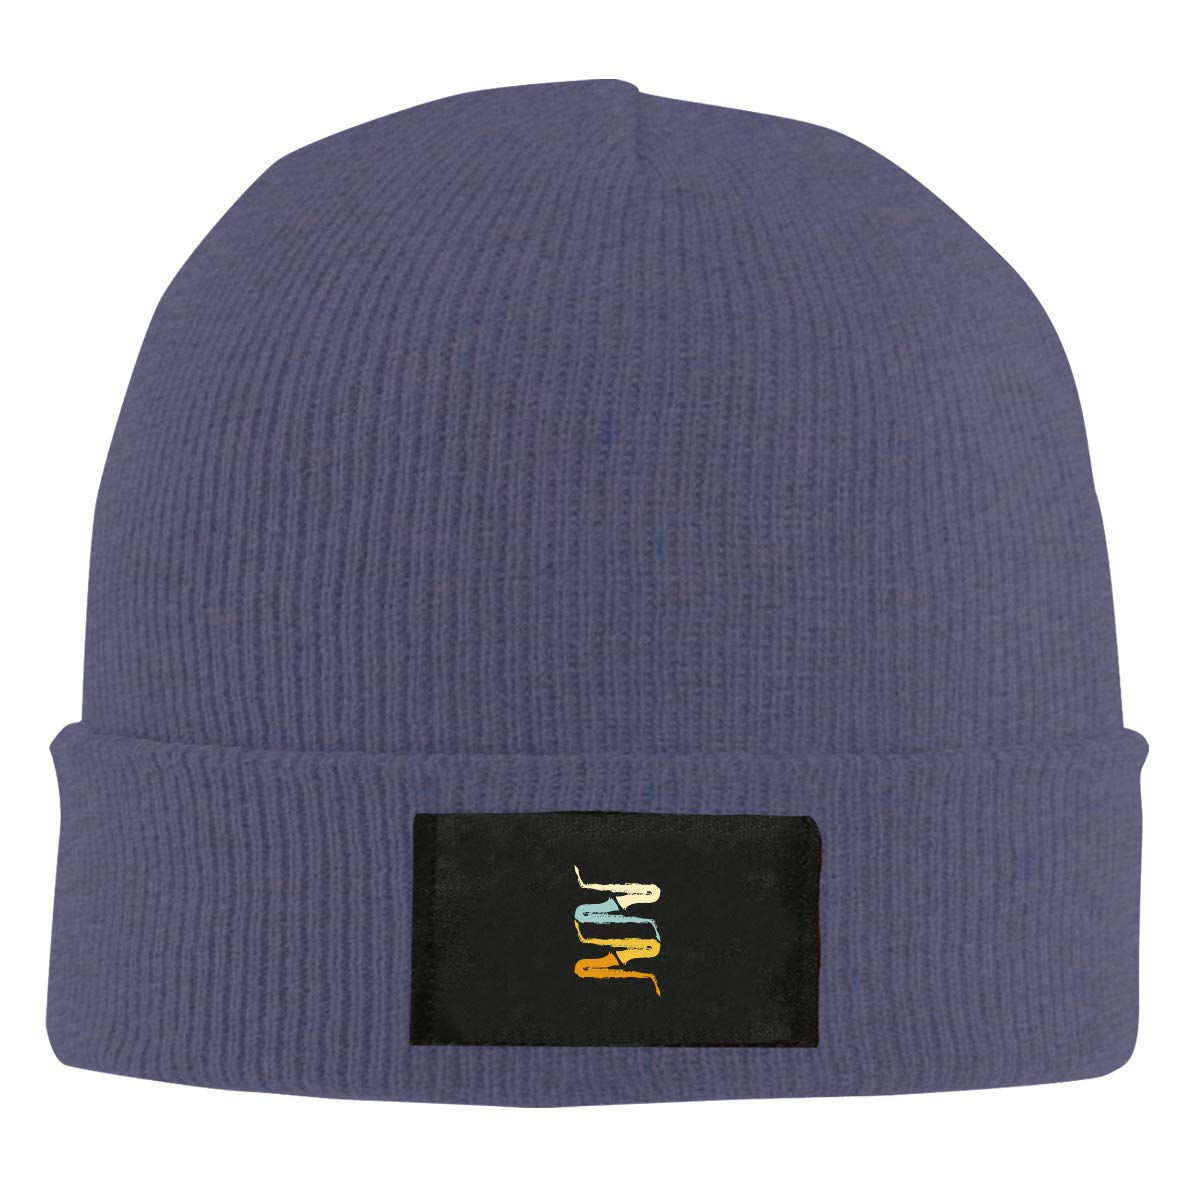 LRHUI Saxophone Winter Knitted Hat Warm Wool Skull Beanie Cap